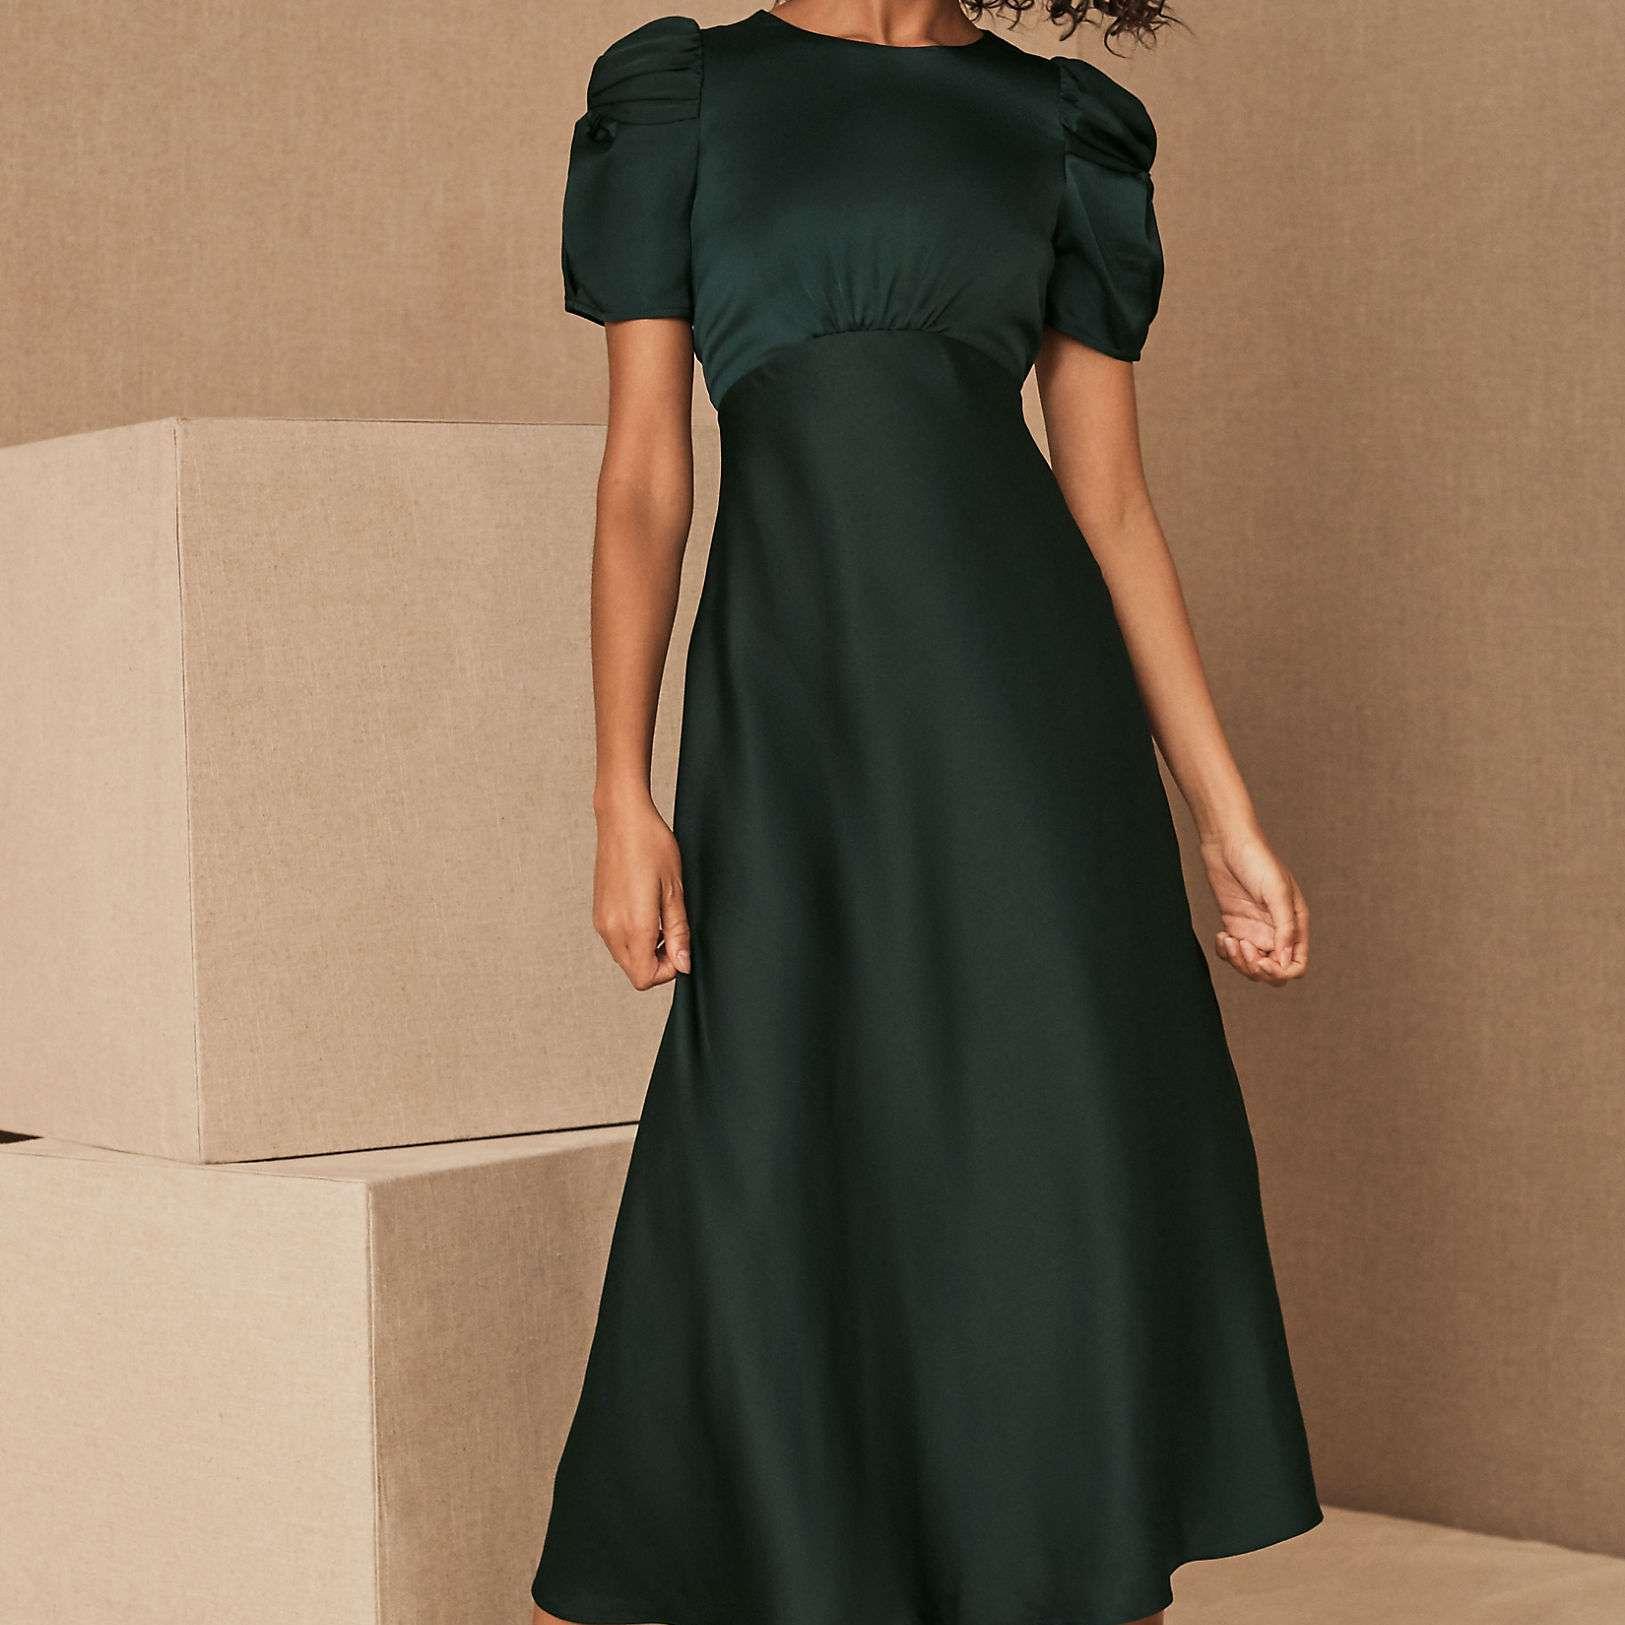 BHLDN Leyden Satin Midi Dress $198